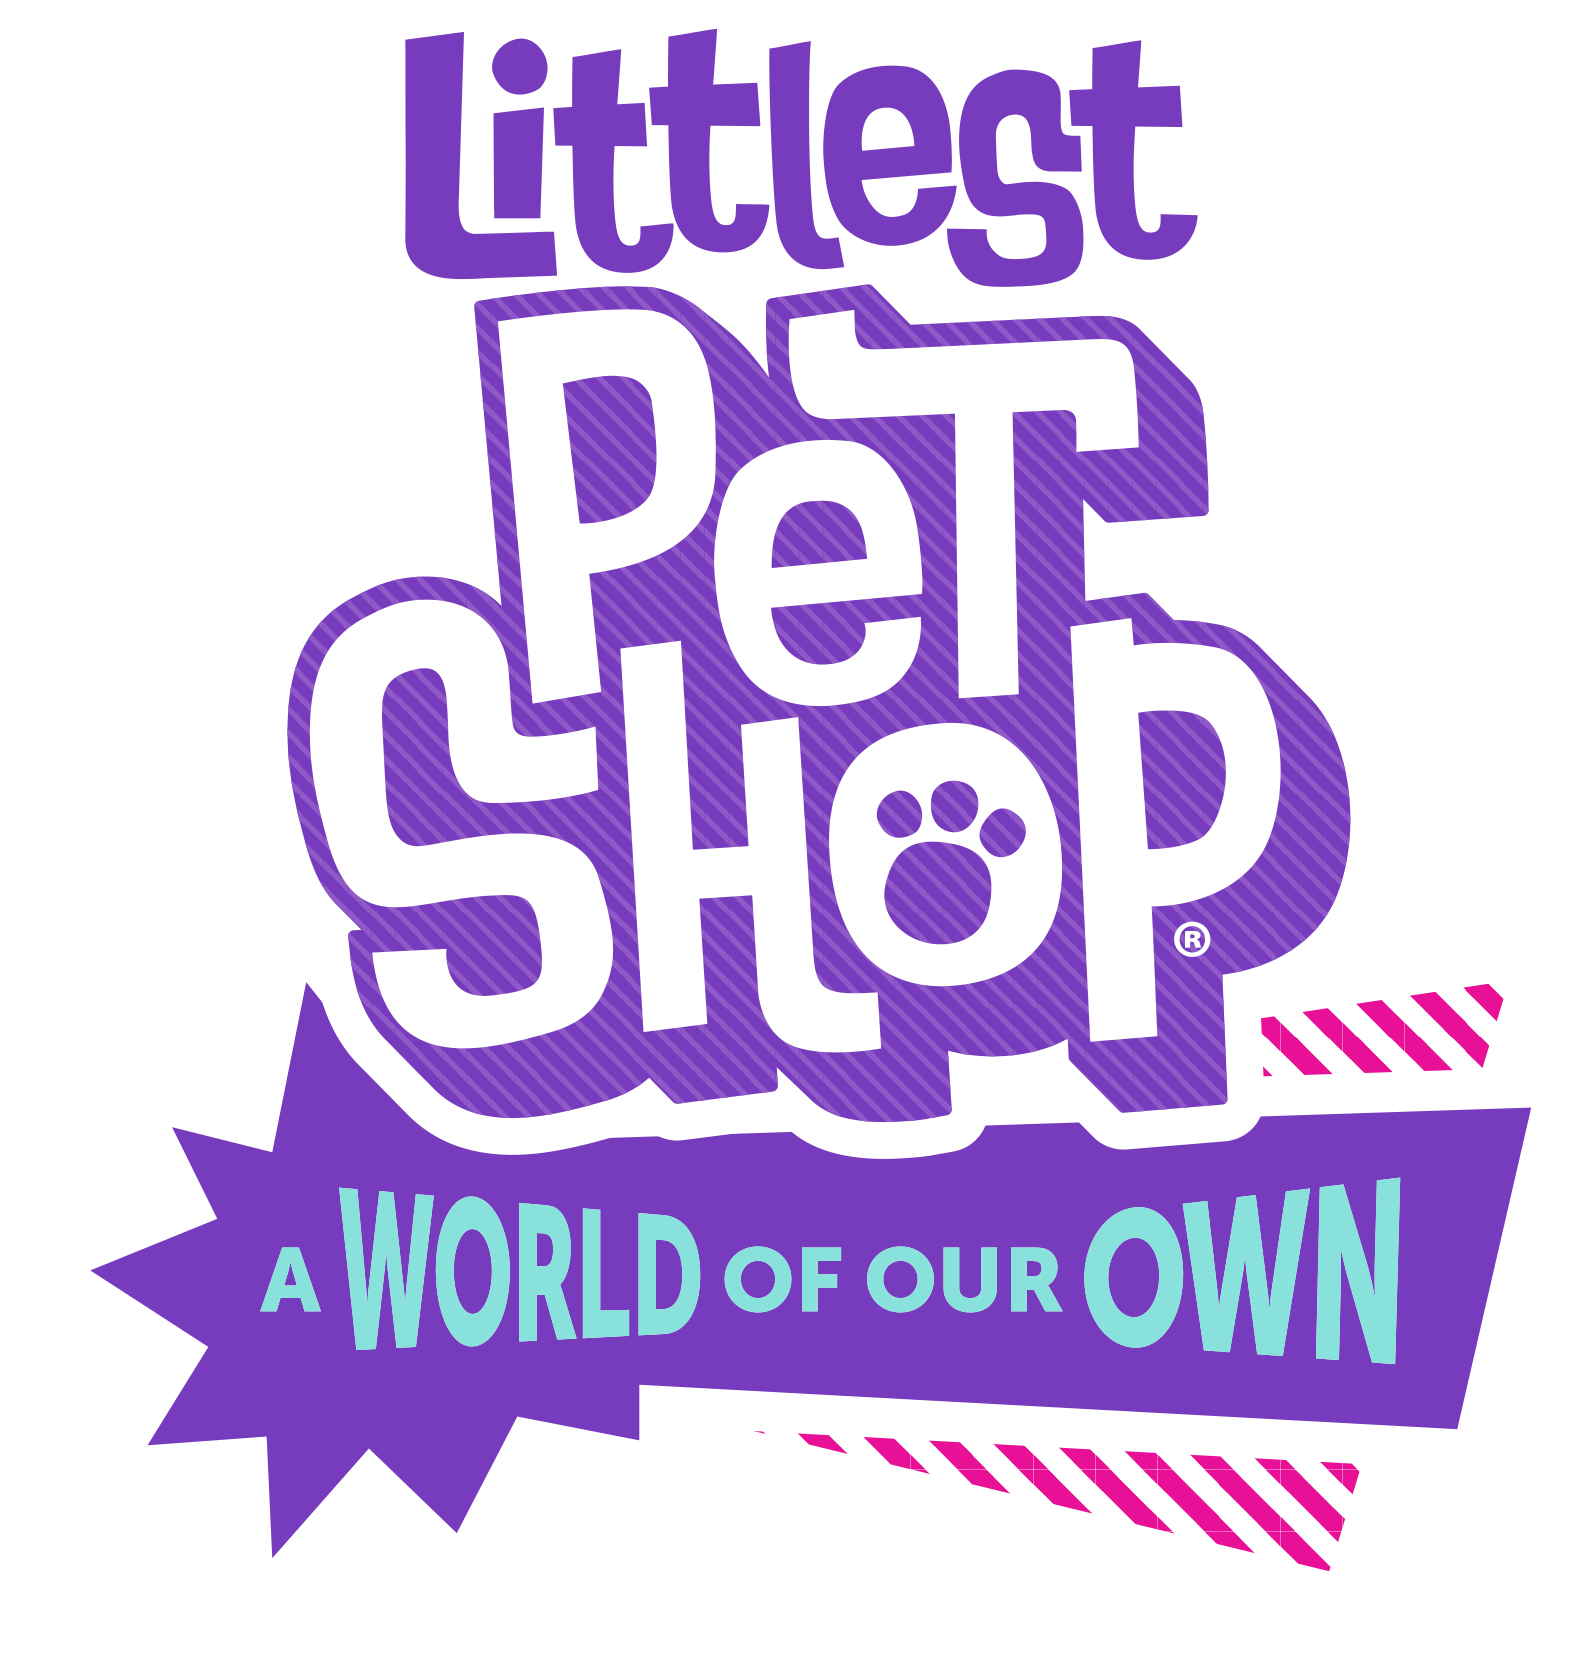 English clipart english project. Image littlest pet shop